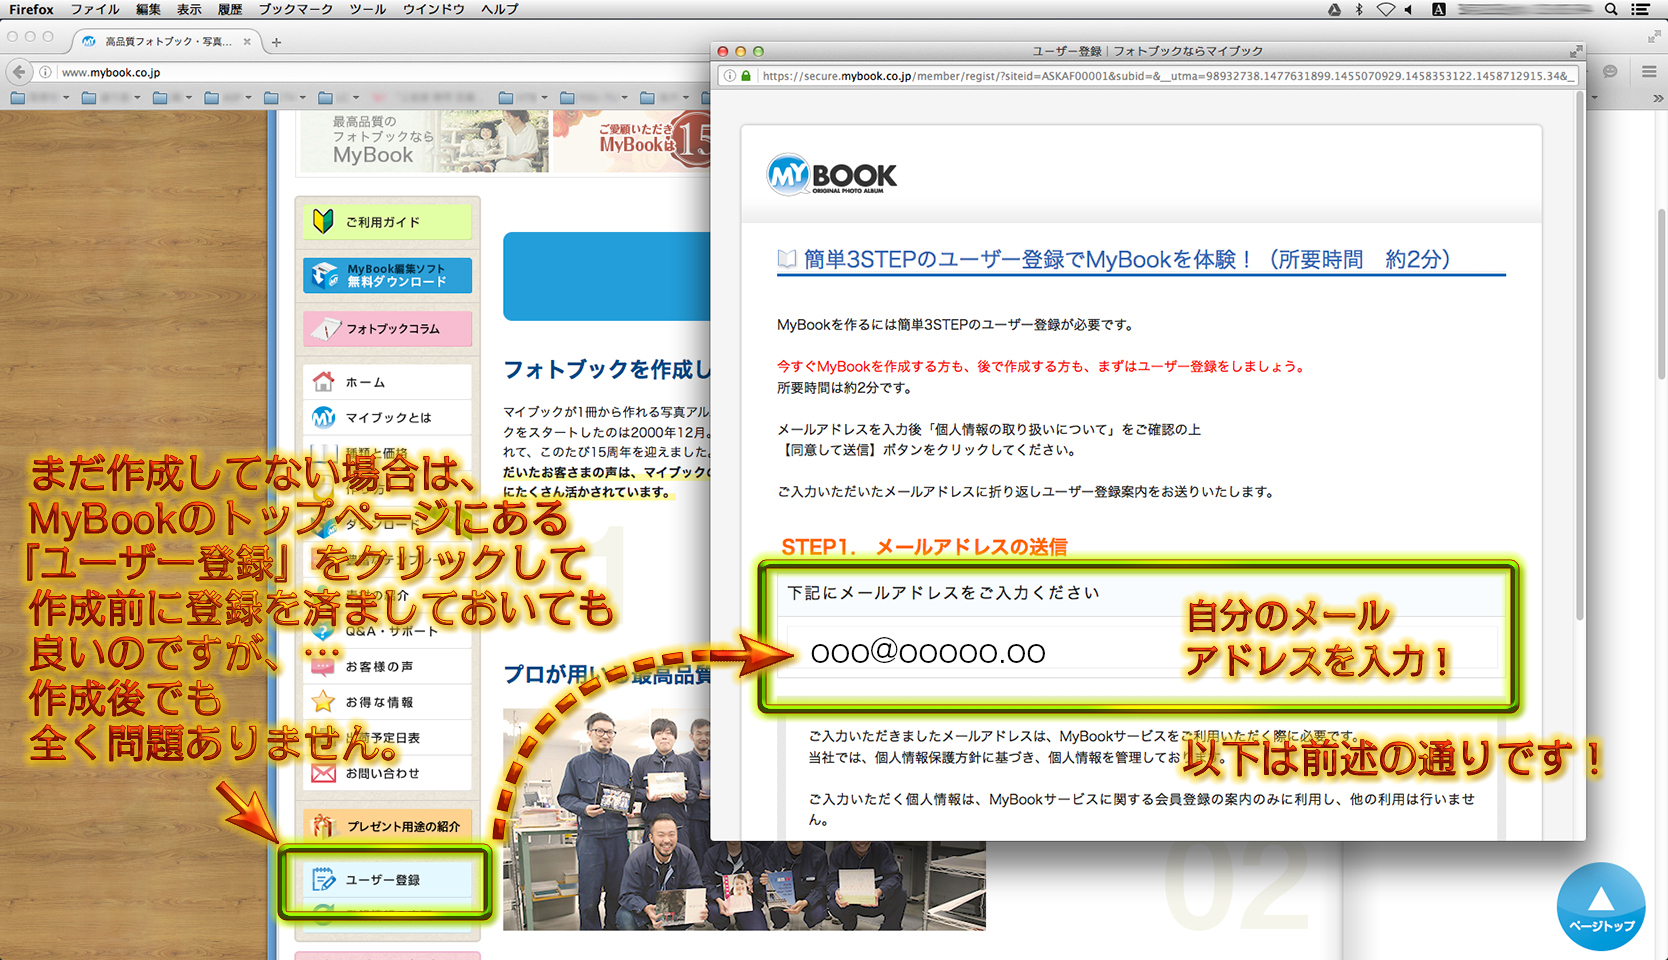 http://moritetsu.info/car/img/mb162-2016-03-23-15-05-54sssss.jpg